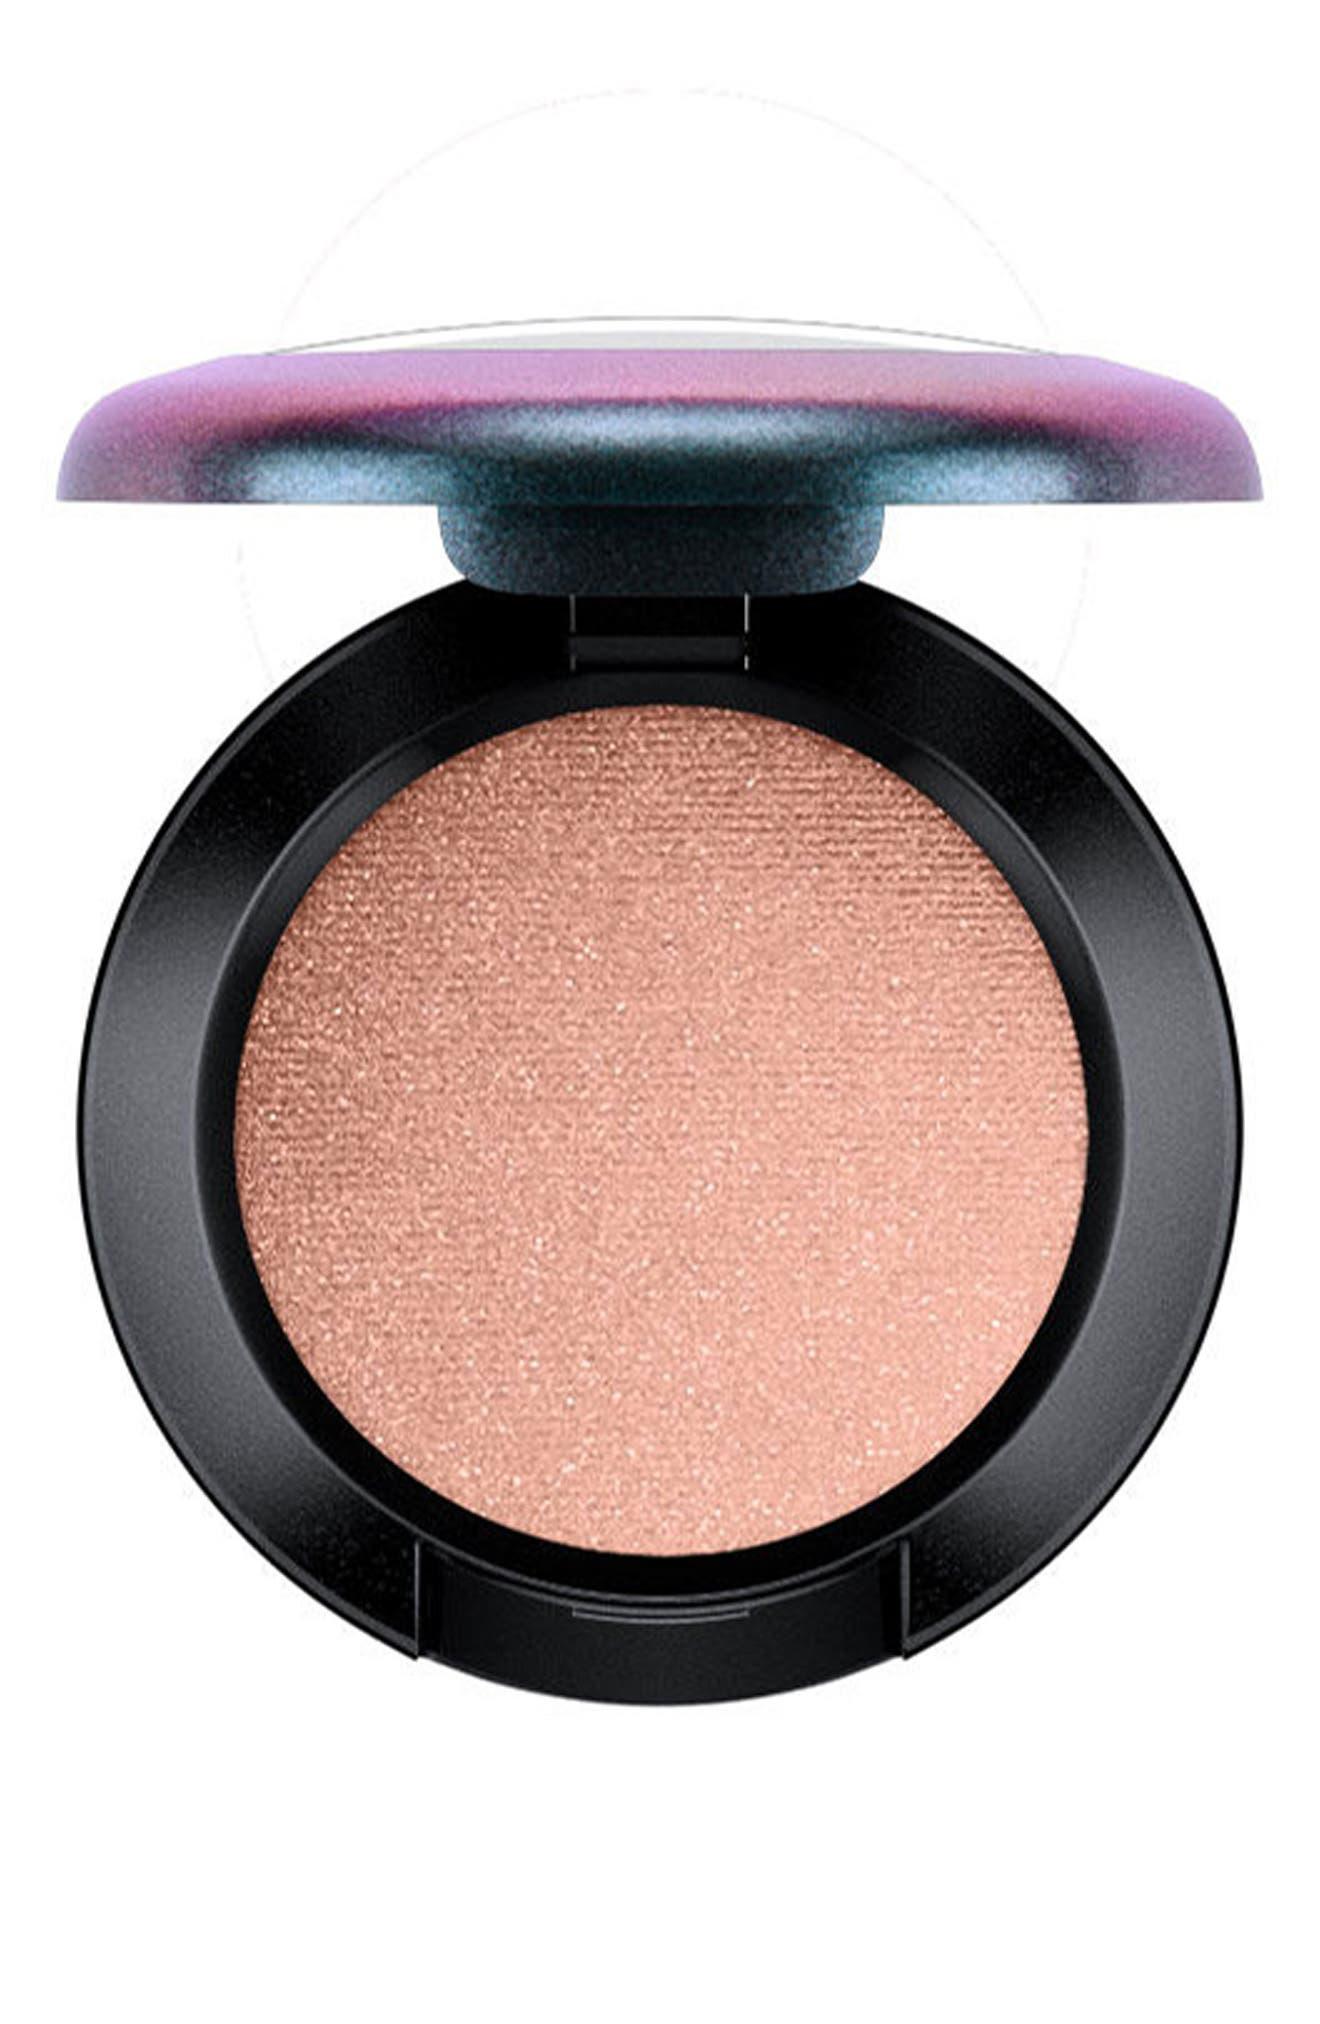 MAC Mirage Noir Eyeshadow (Limited Edition)